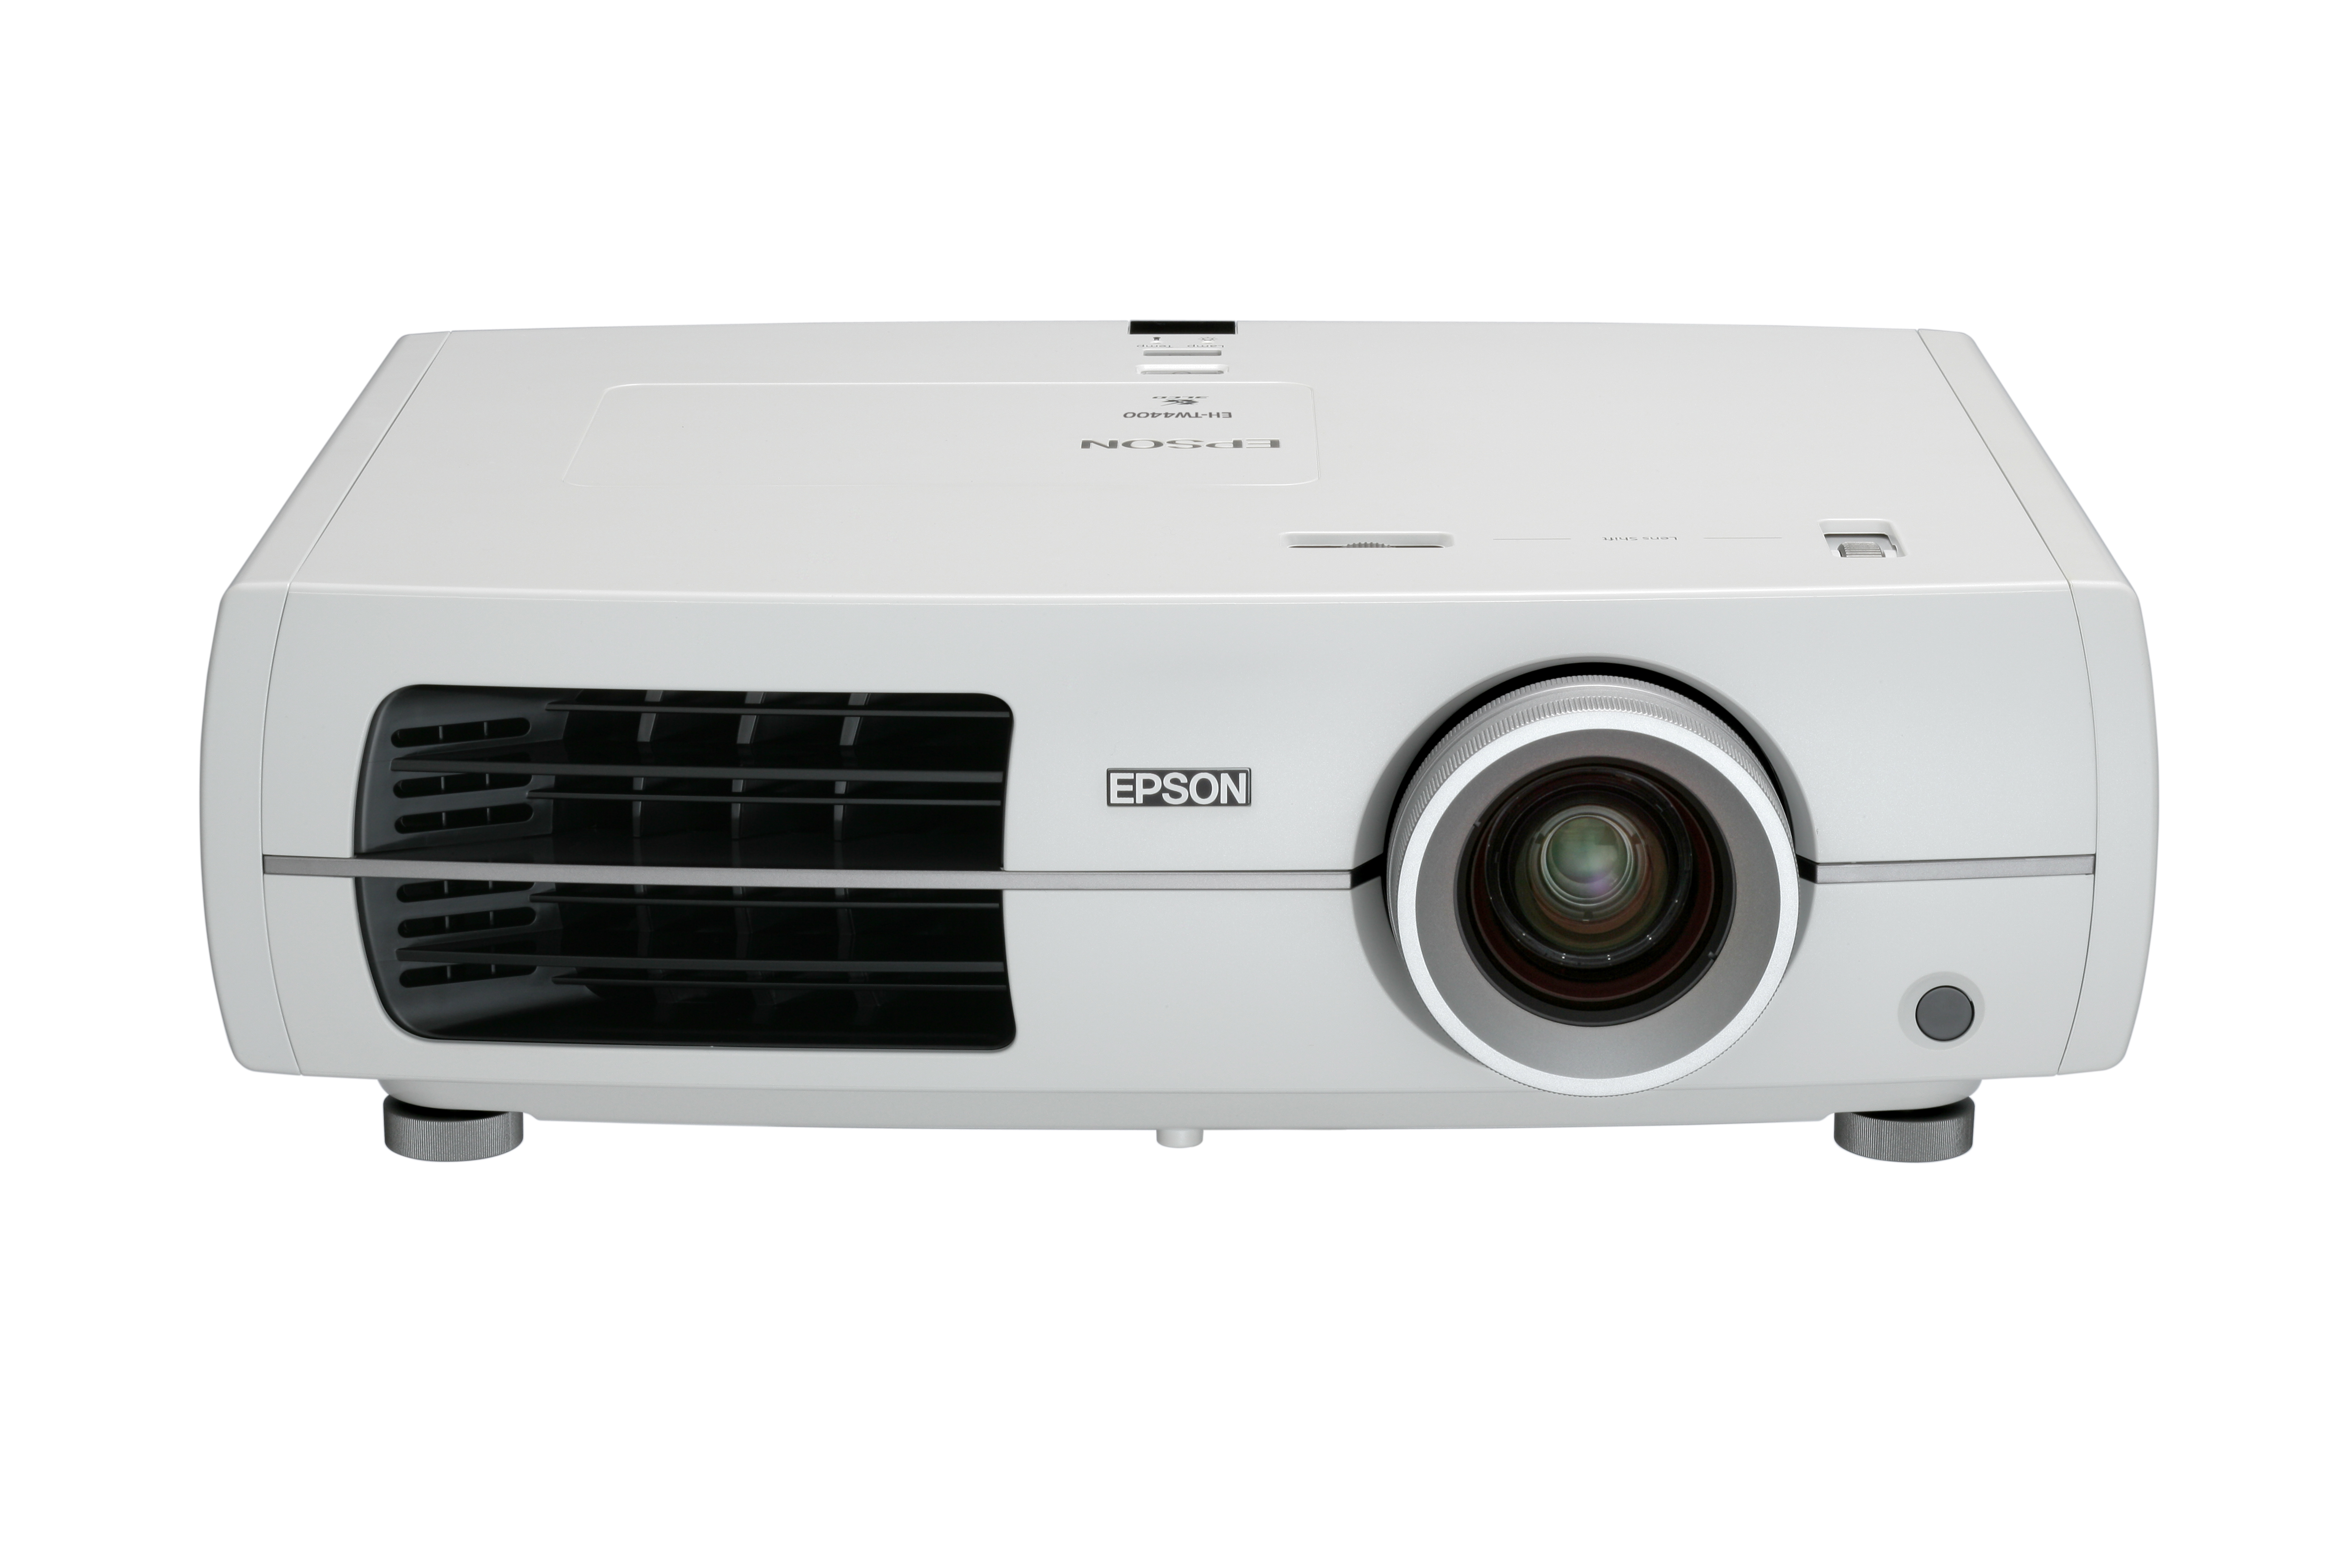 Epson Projektoren Eh Tw4400 Hdtv Lcd Beamer Projector Tw570 Home Theatre Projektor